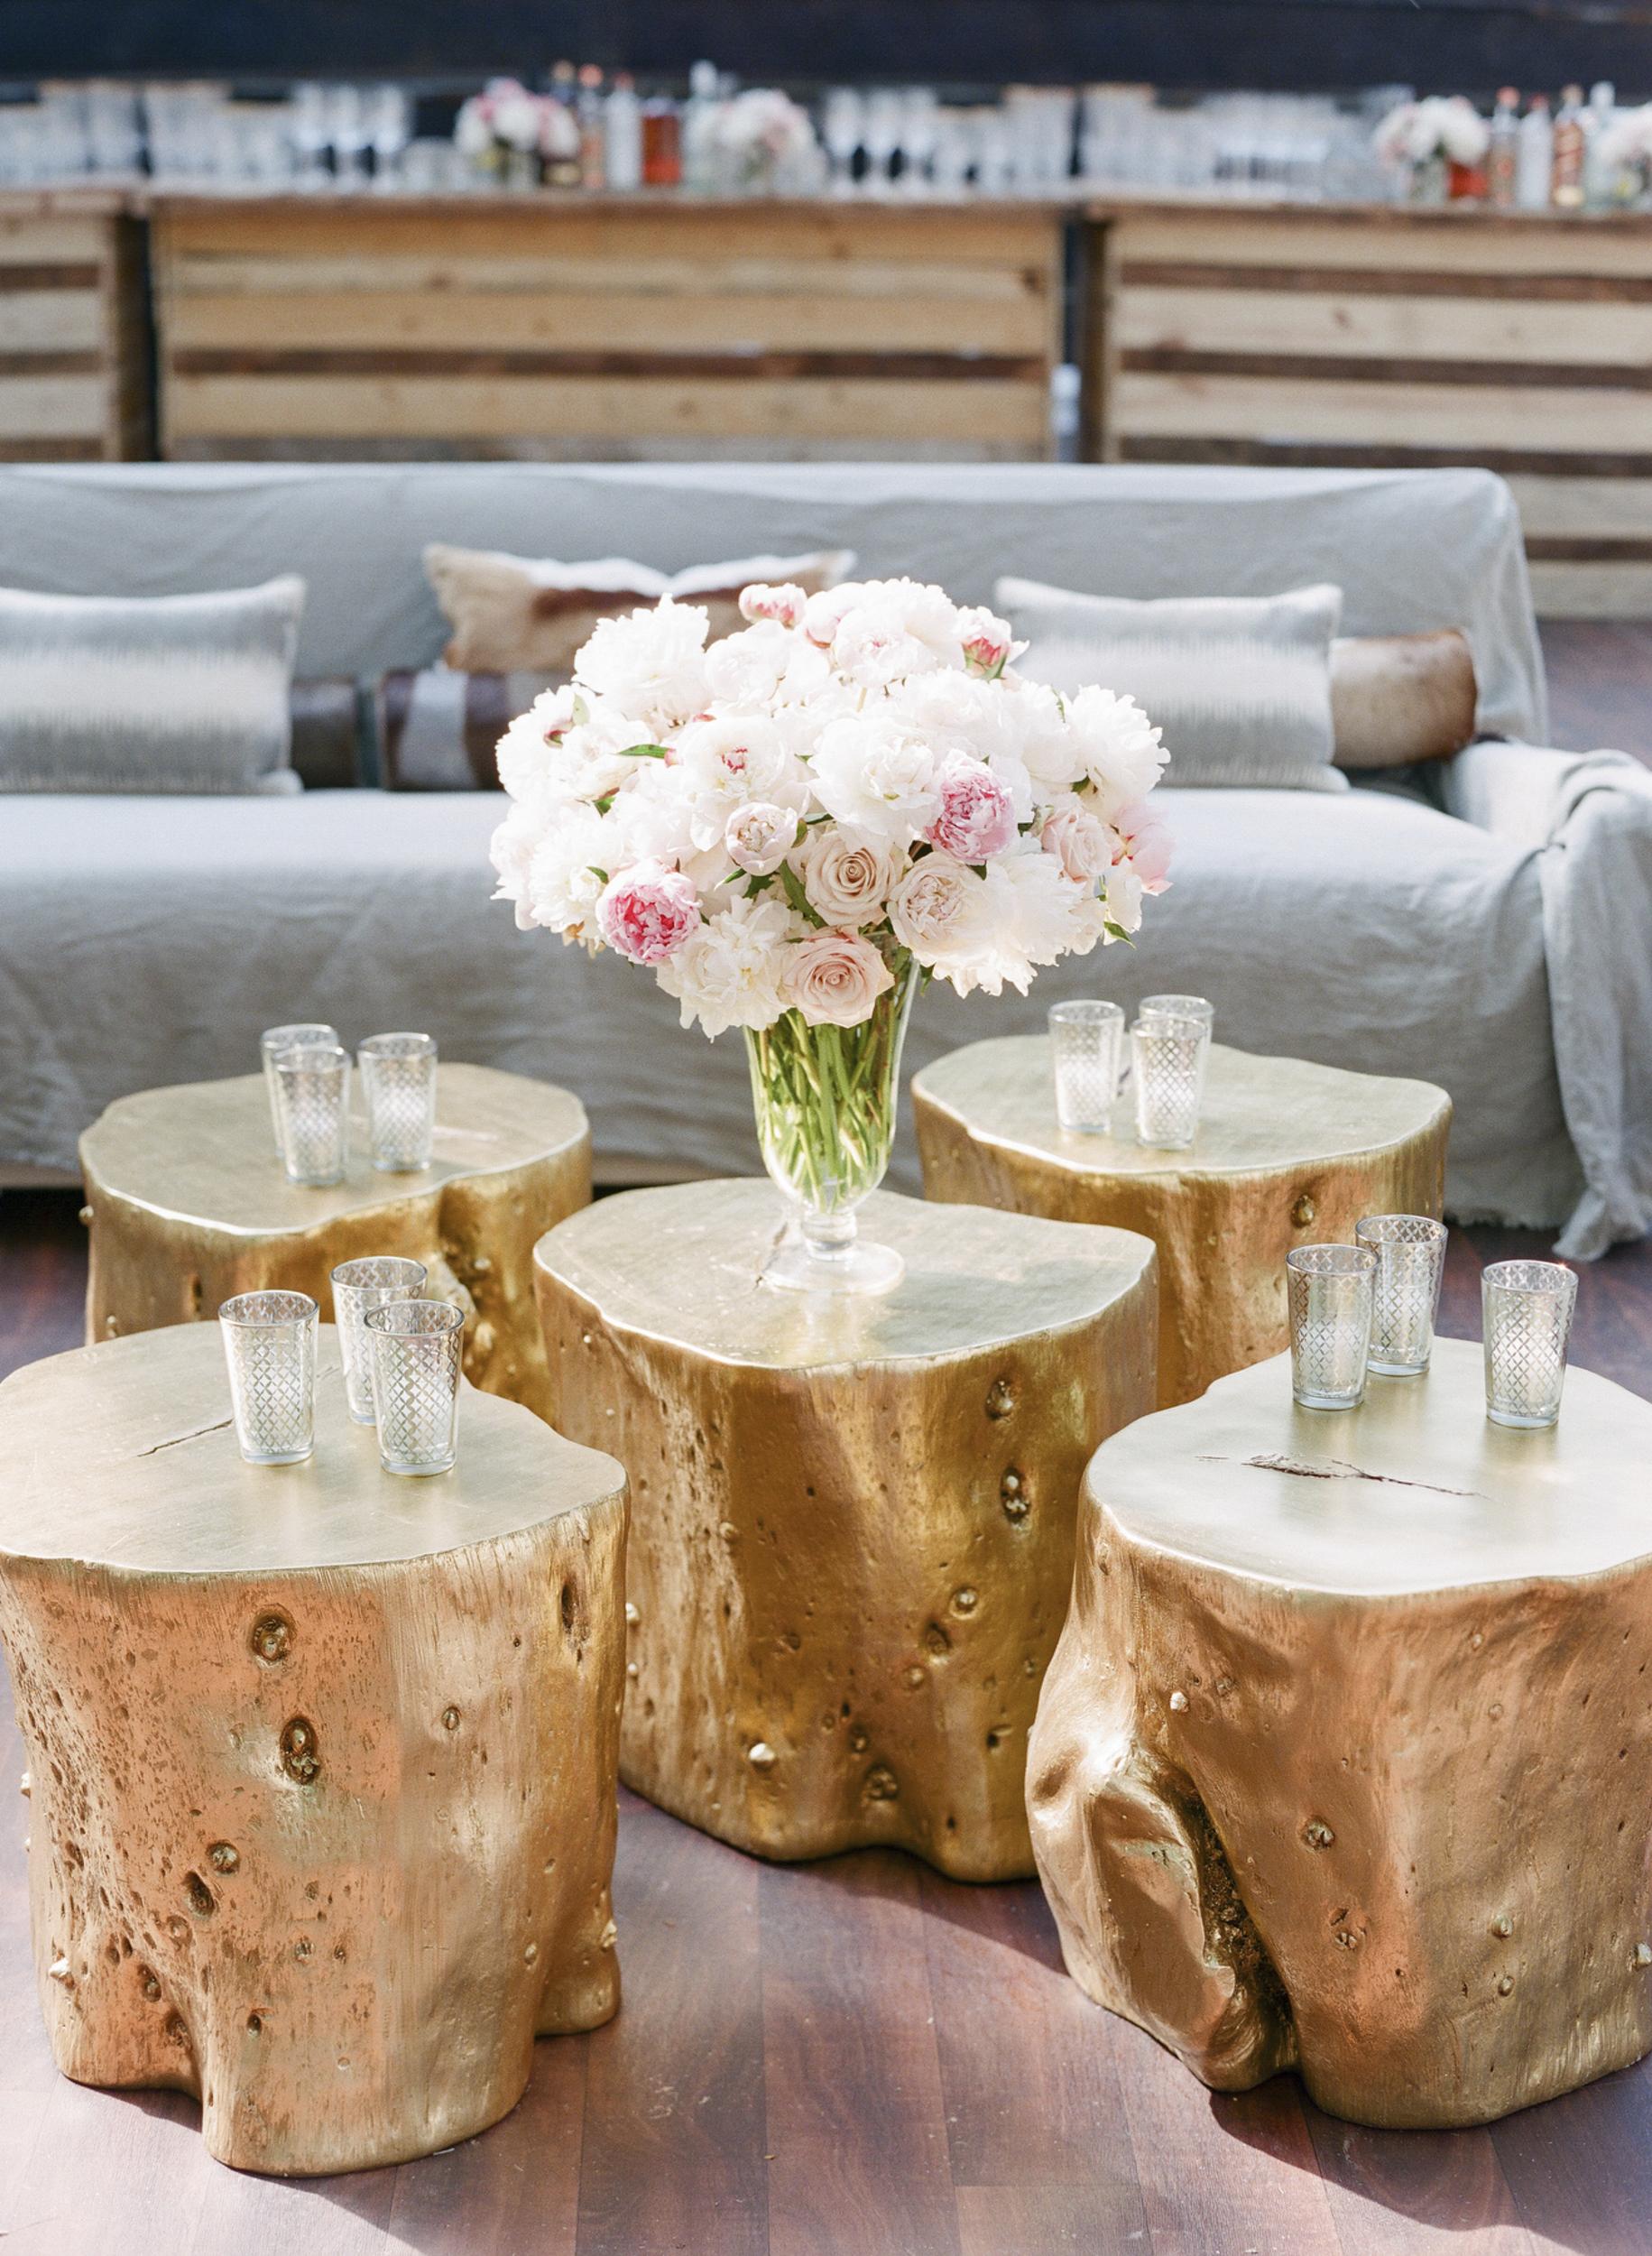 south_carolina_farm_wedding_rustic_chic_surprise_secret_luxe_wedding_bachelorette_emily_maynard_real_weddings-2.jpg